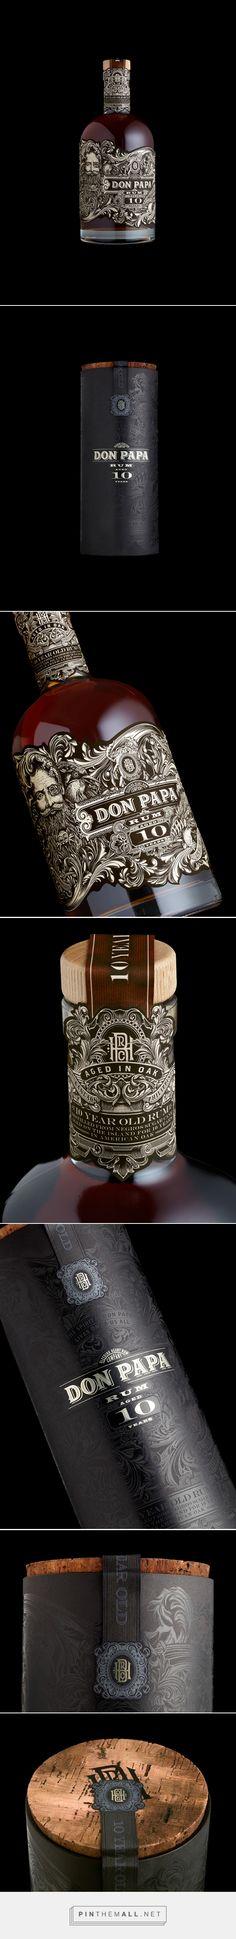 Don Papa #Rum 10 Year Old #packaging designed by Stranger & Stranger - http://www.packagingoftheworld.com/2015/06/don-papa-10-year-old.html